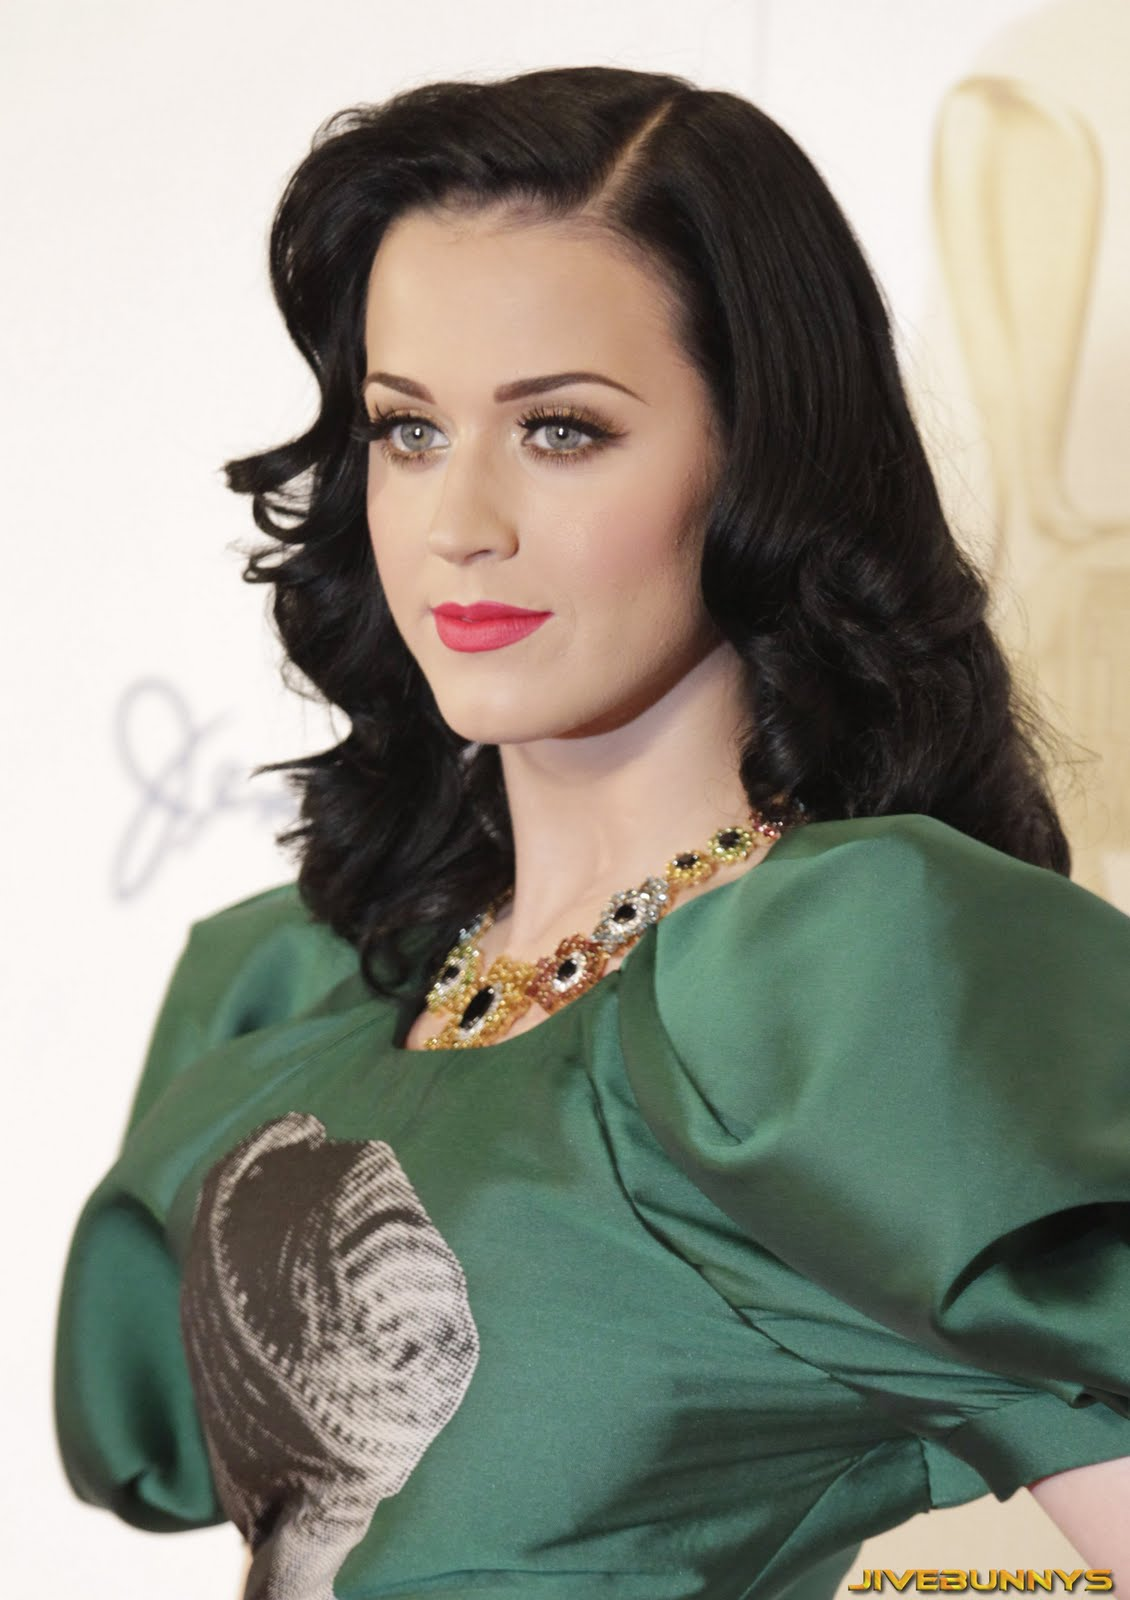 katy perry beauty singer - photo #48